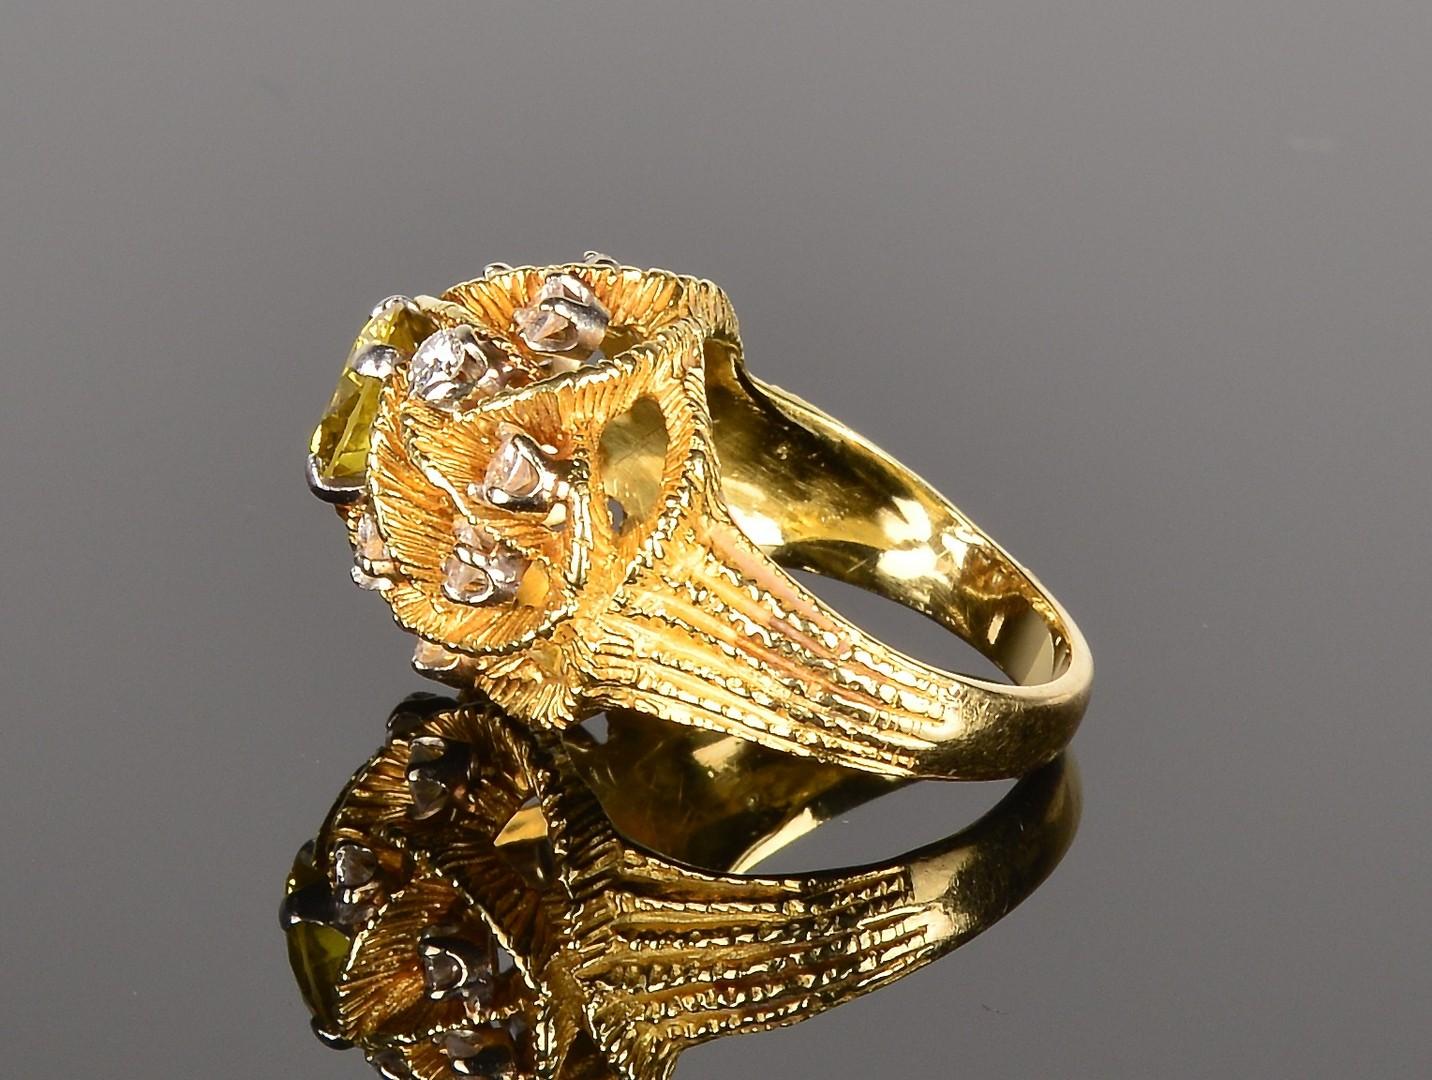 Lot 343: 1.36 ct Fancy Yellow Green Diamond Ring